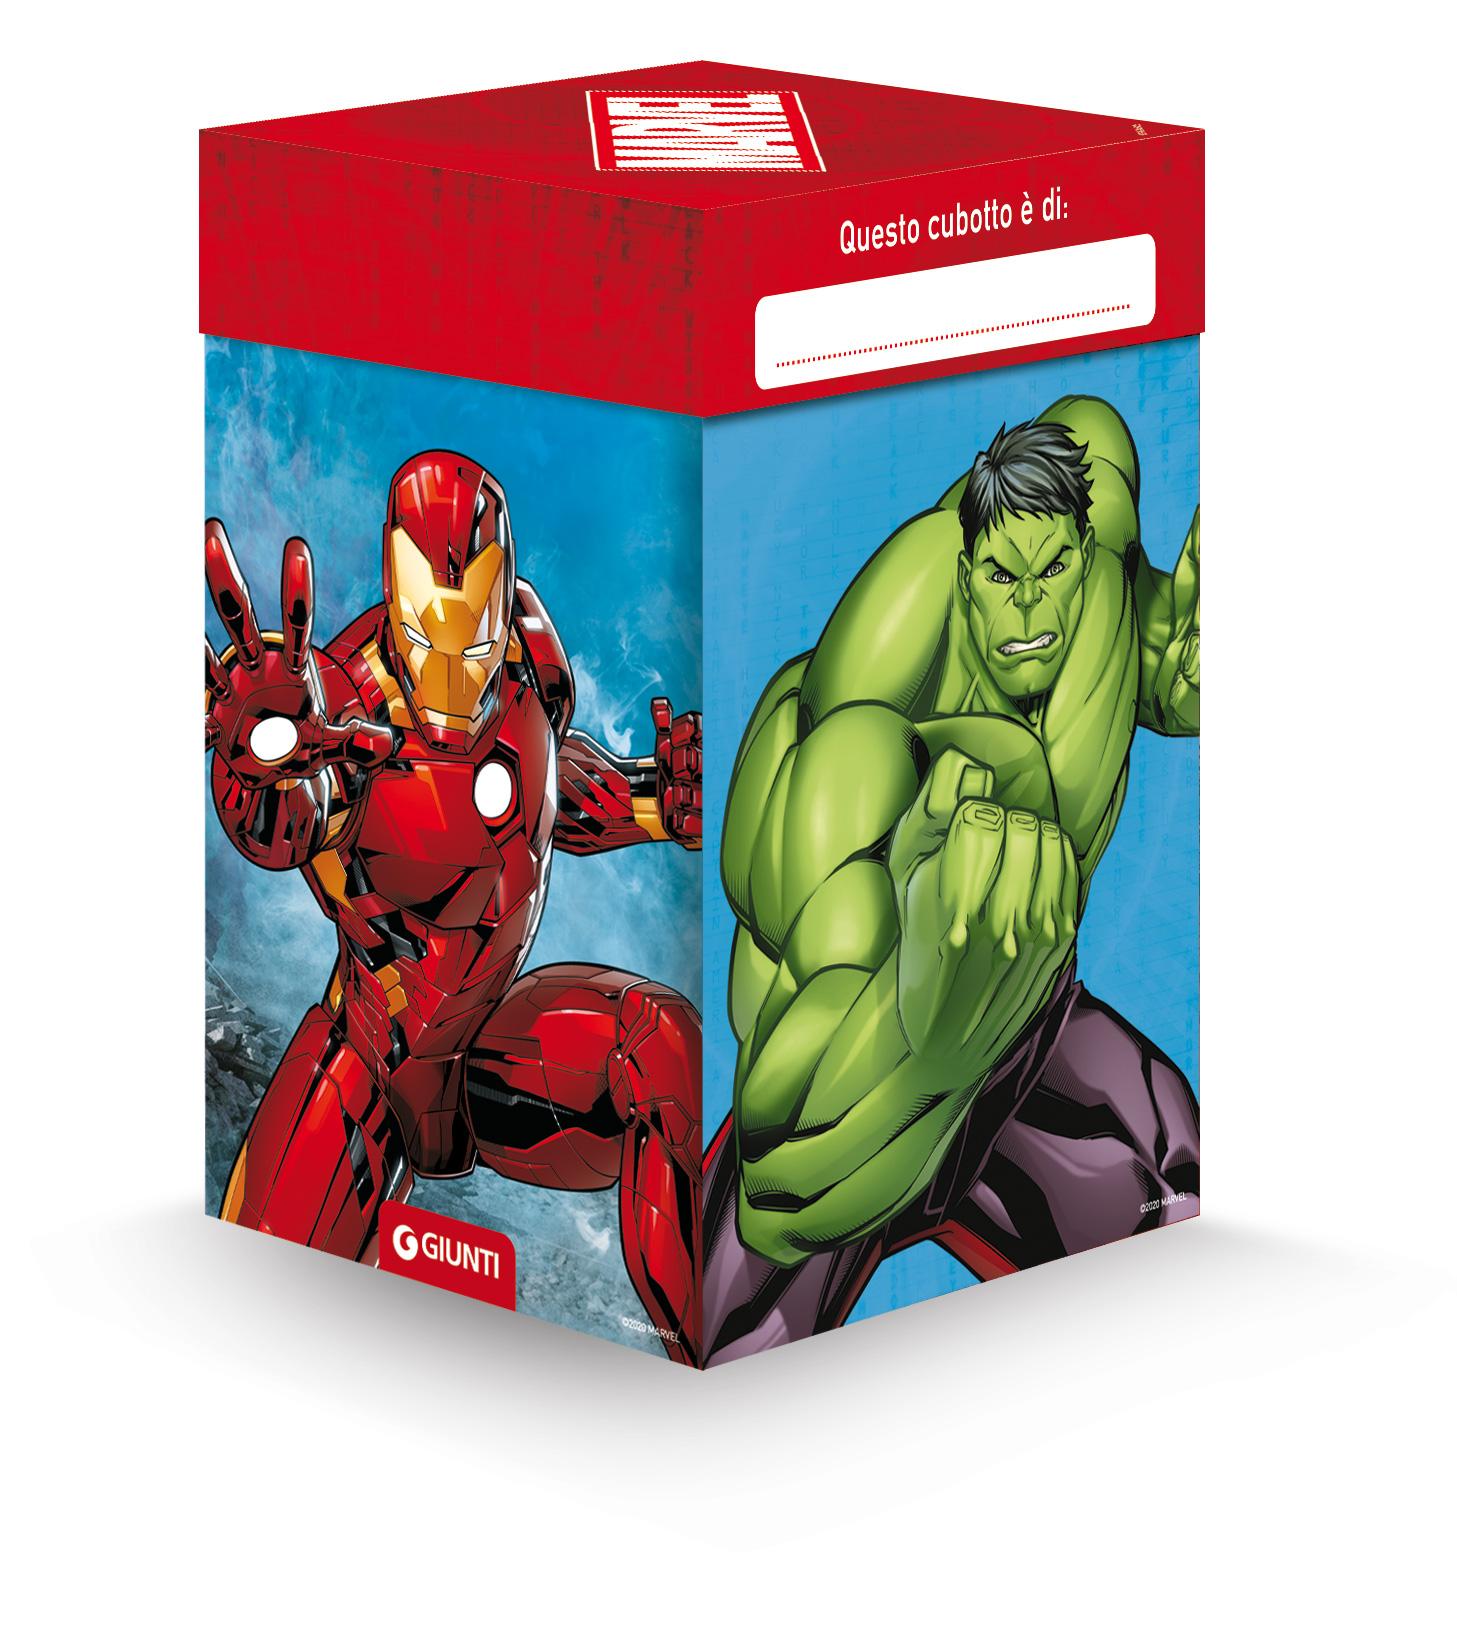 Avengers Cubotti